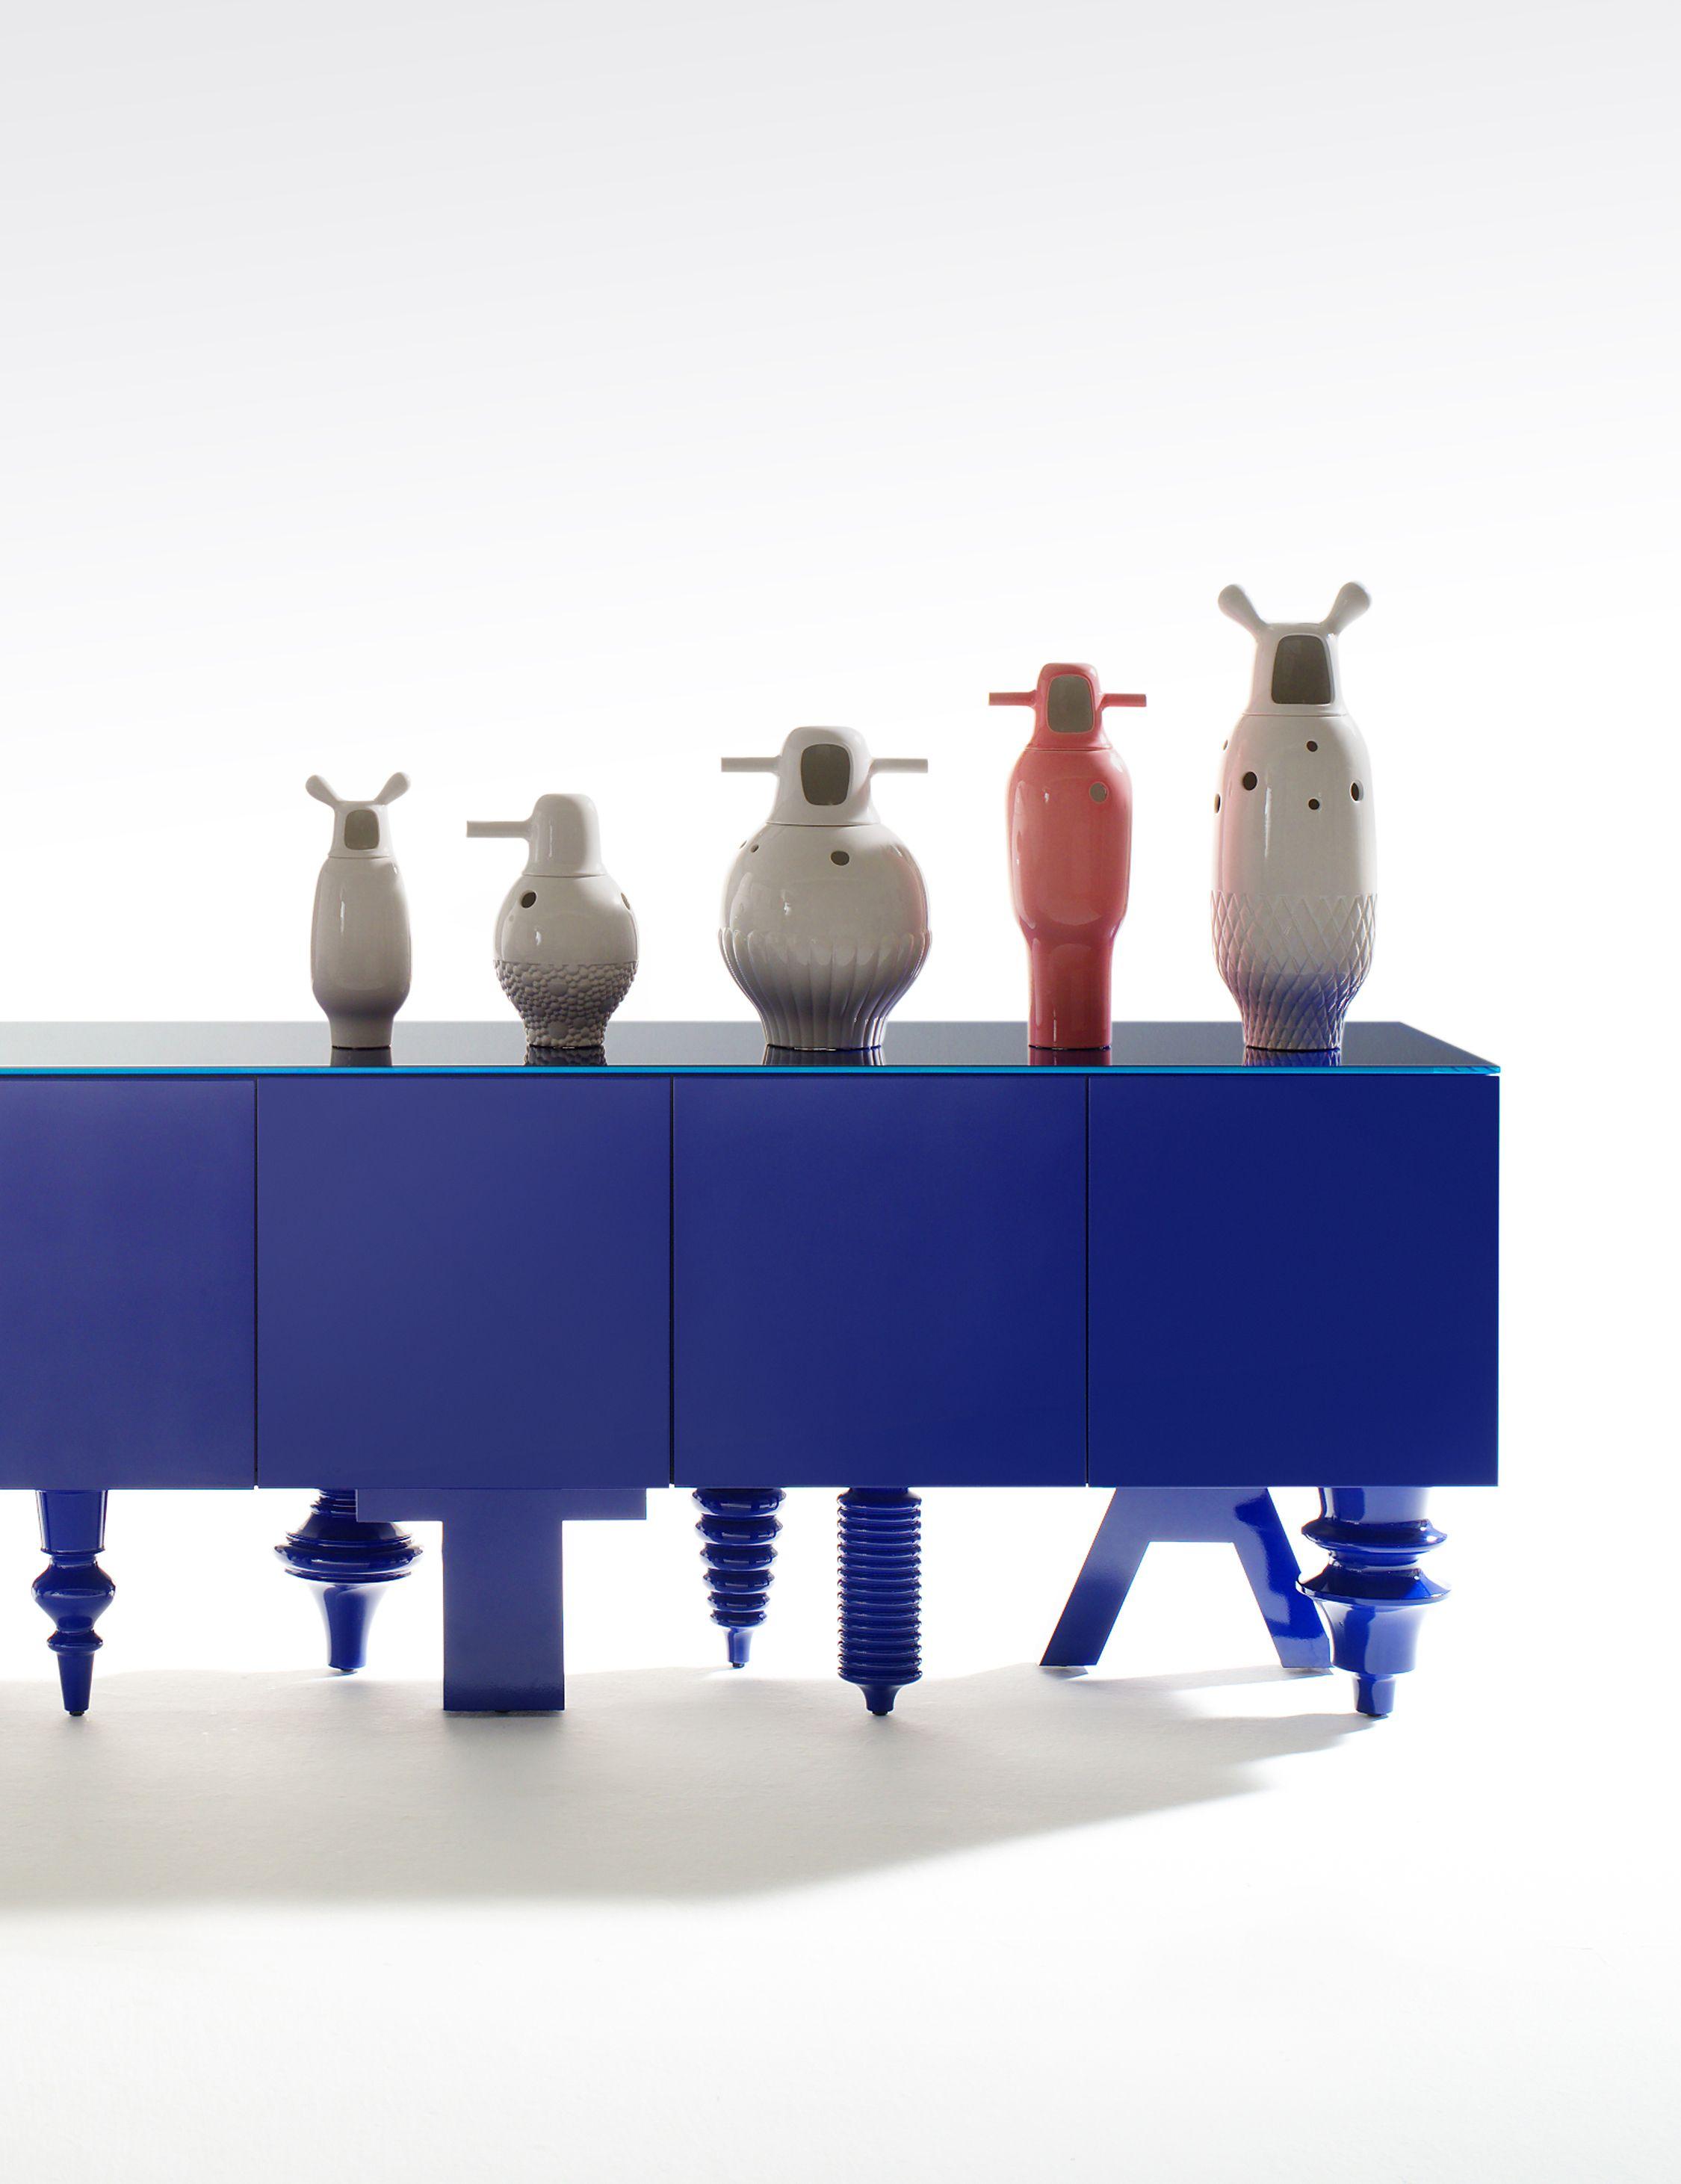 BD Barcelona Design – Multileg. Design: Jaime Hayon